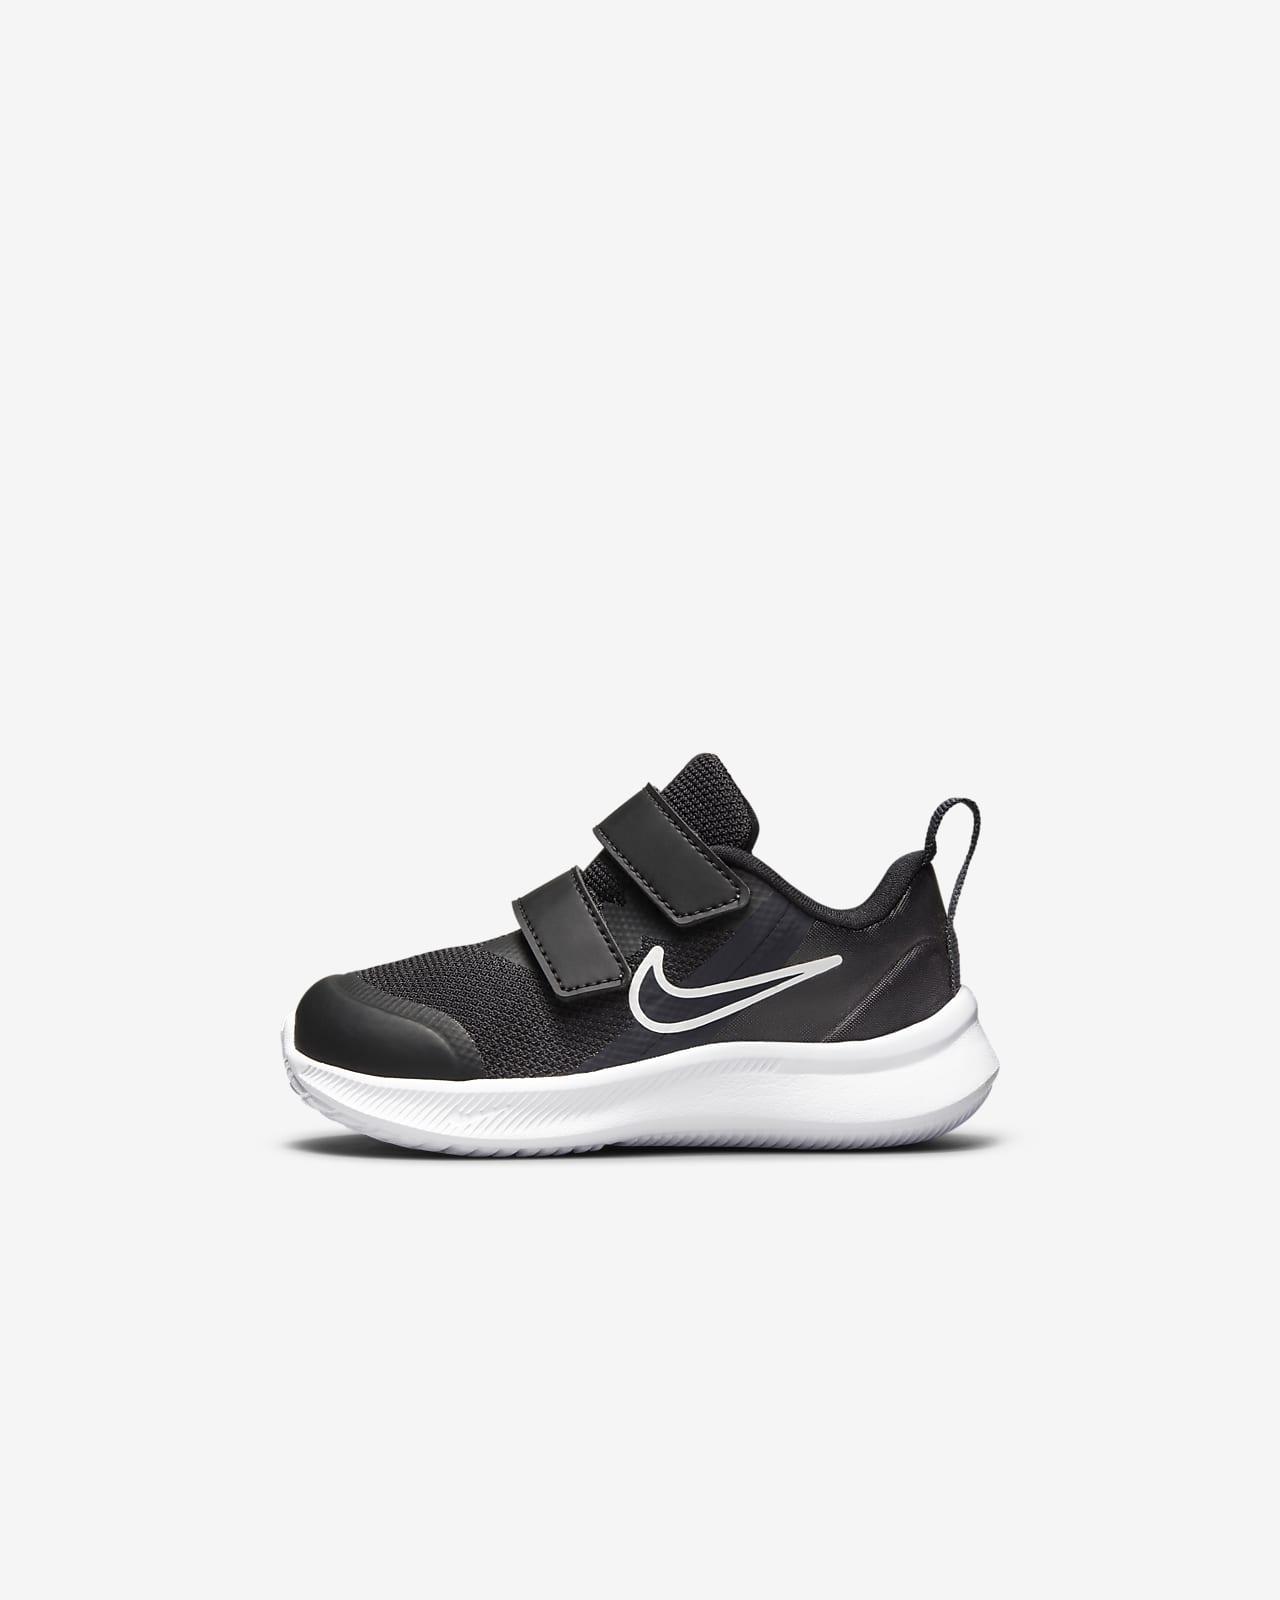 Nike Star Runner 3 Baby & Toddler Shoes